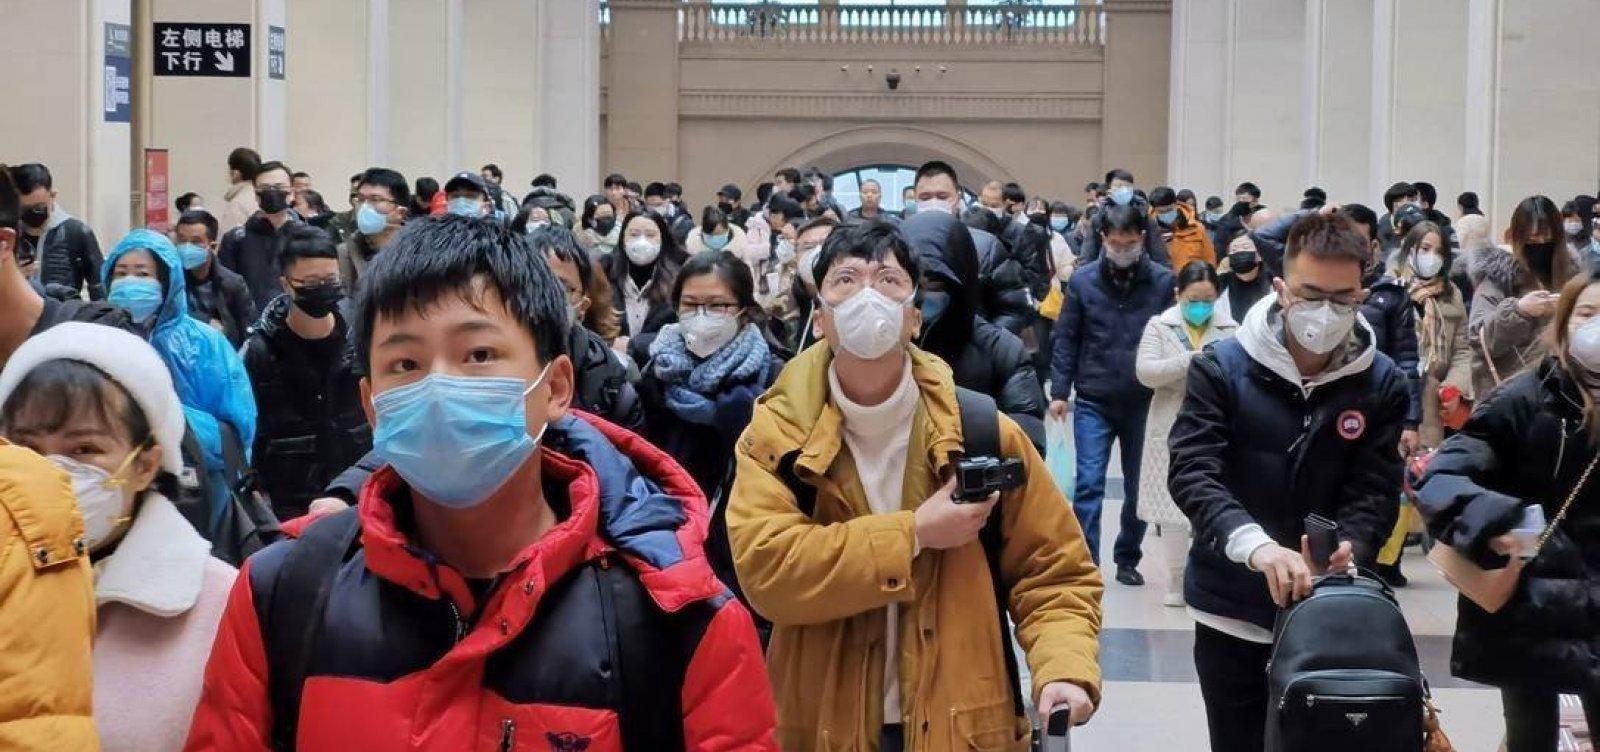 China adia maratona de Wuhan após novo surto de Covid